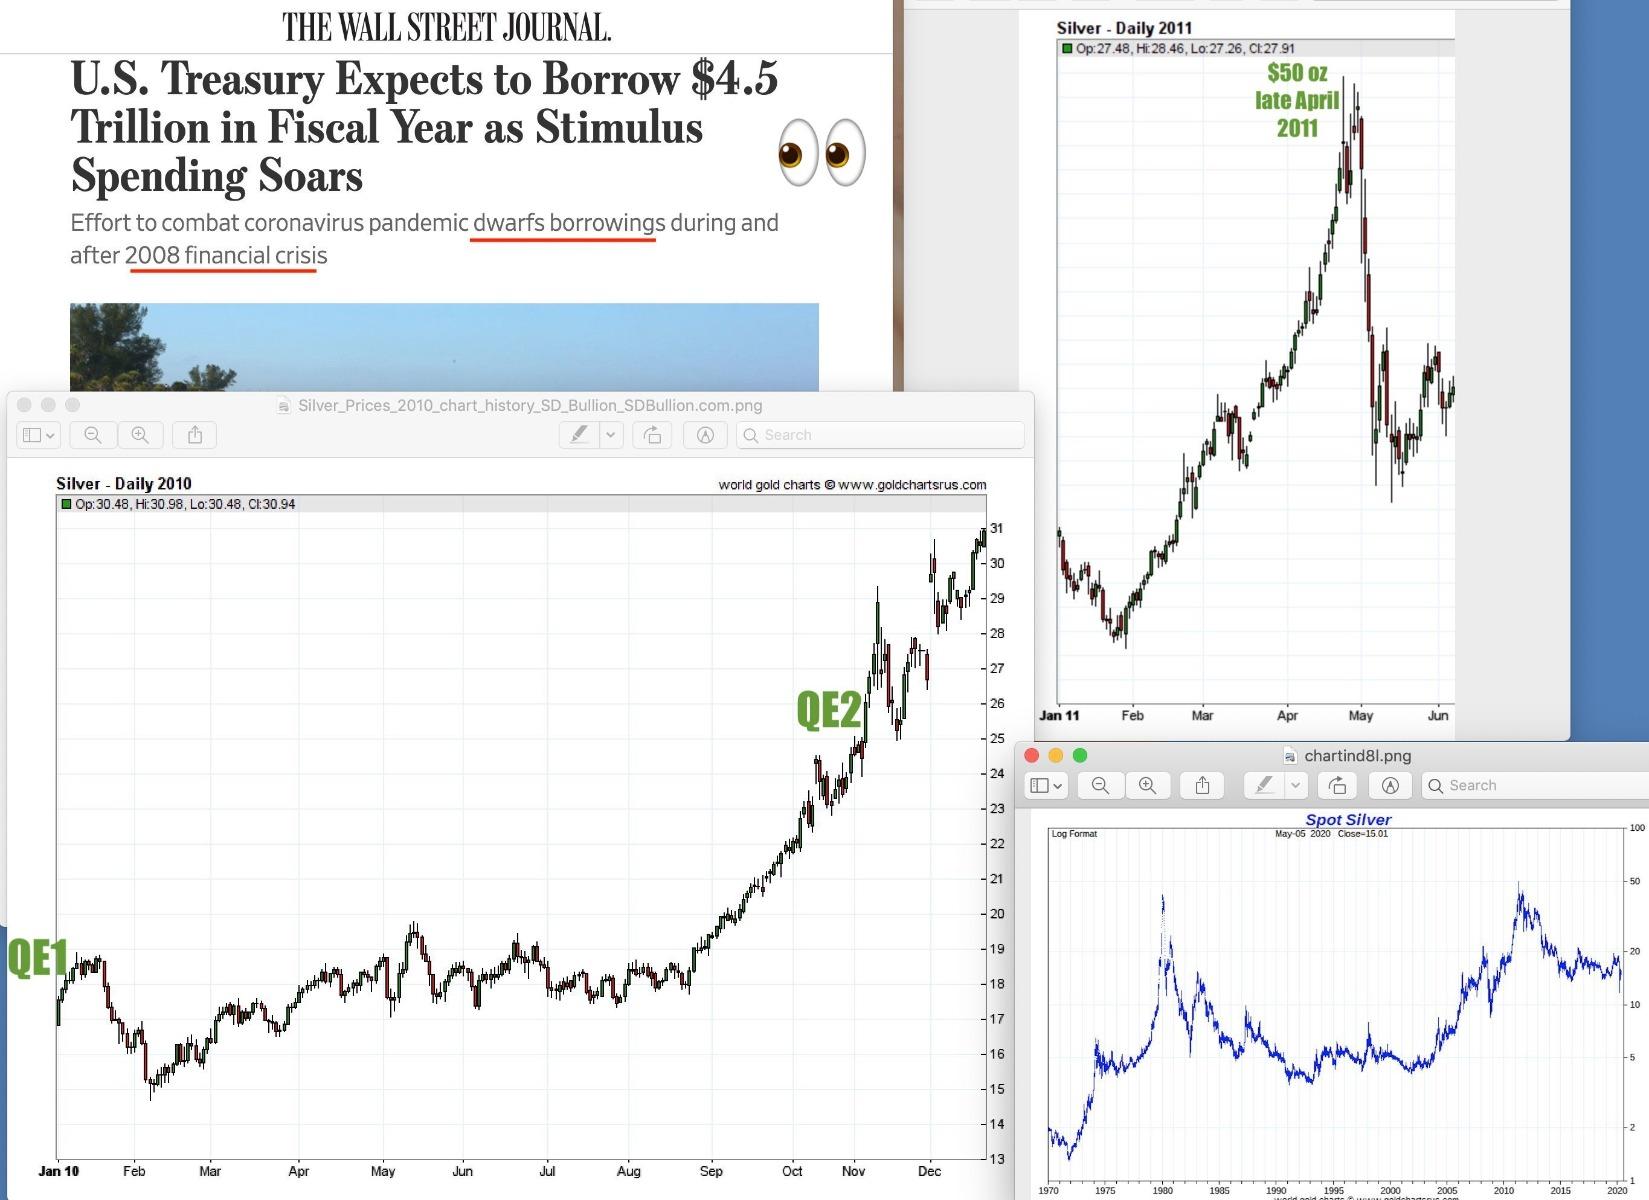 QE1 QE2 Silver Prices 2010-2011